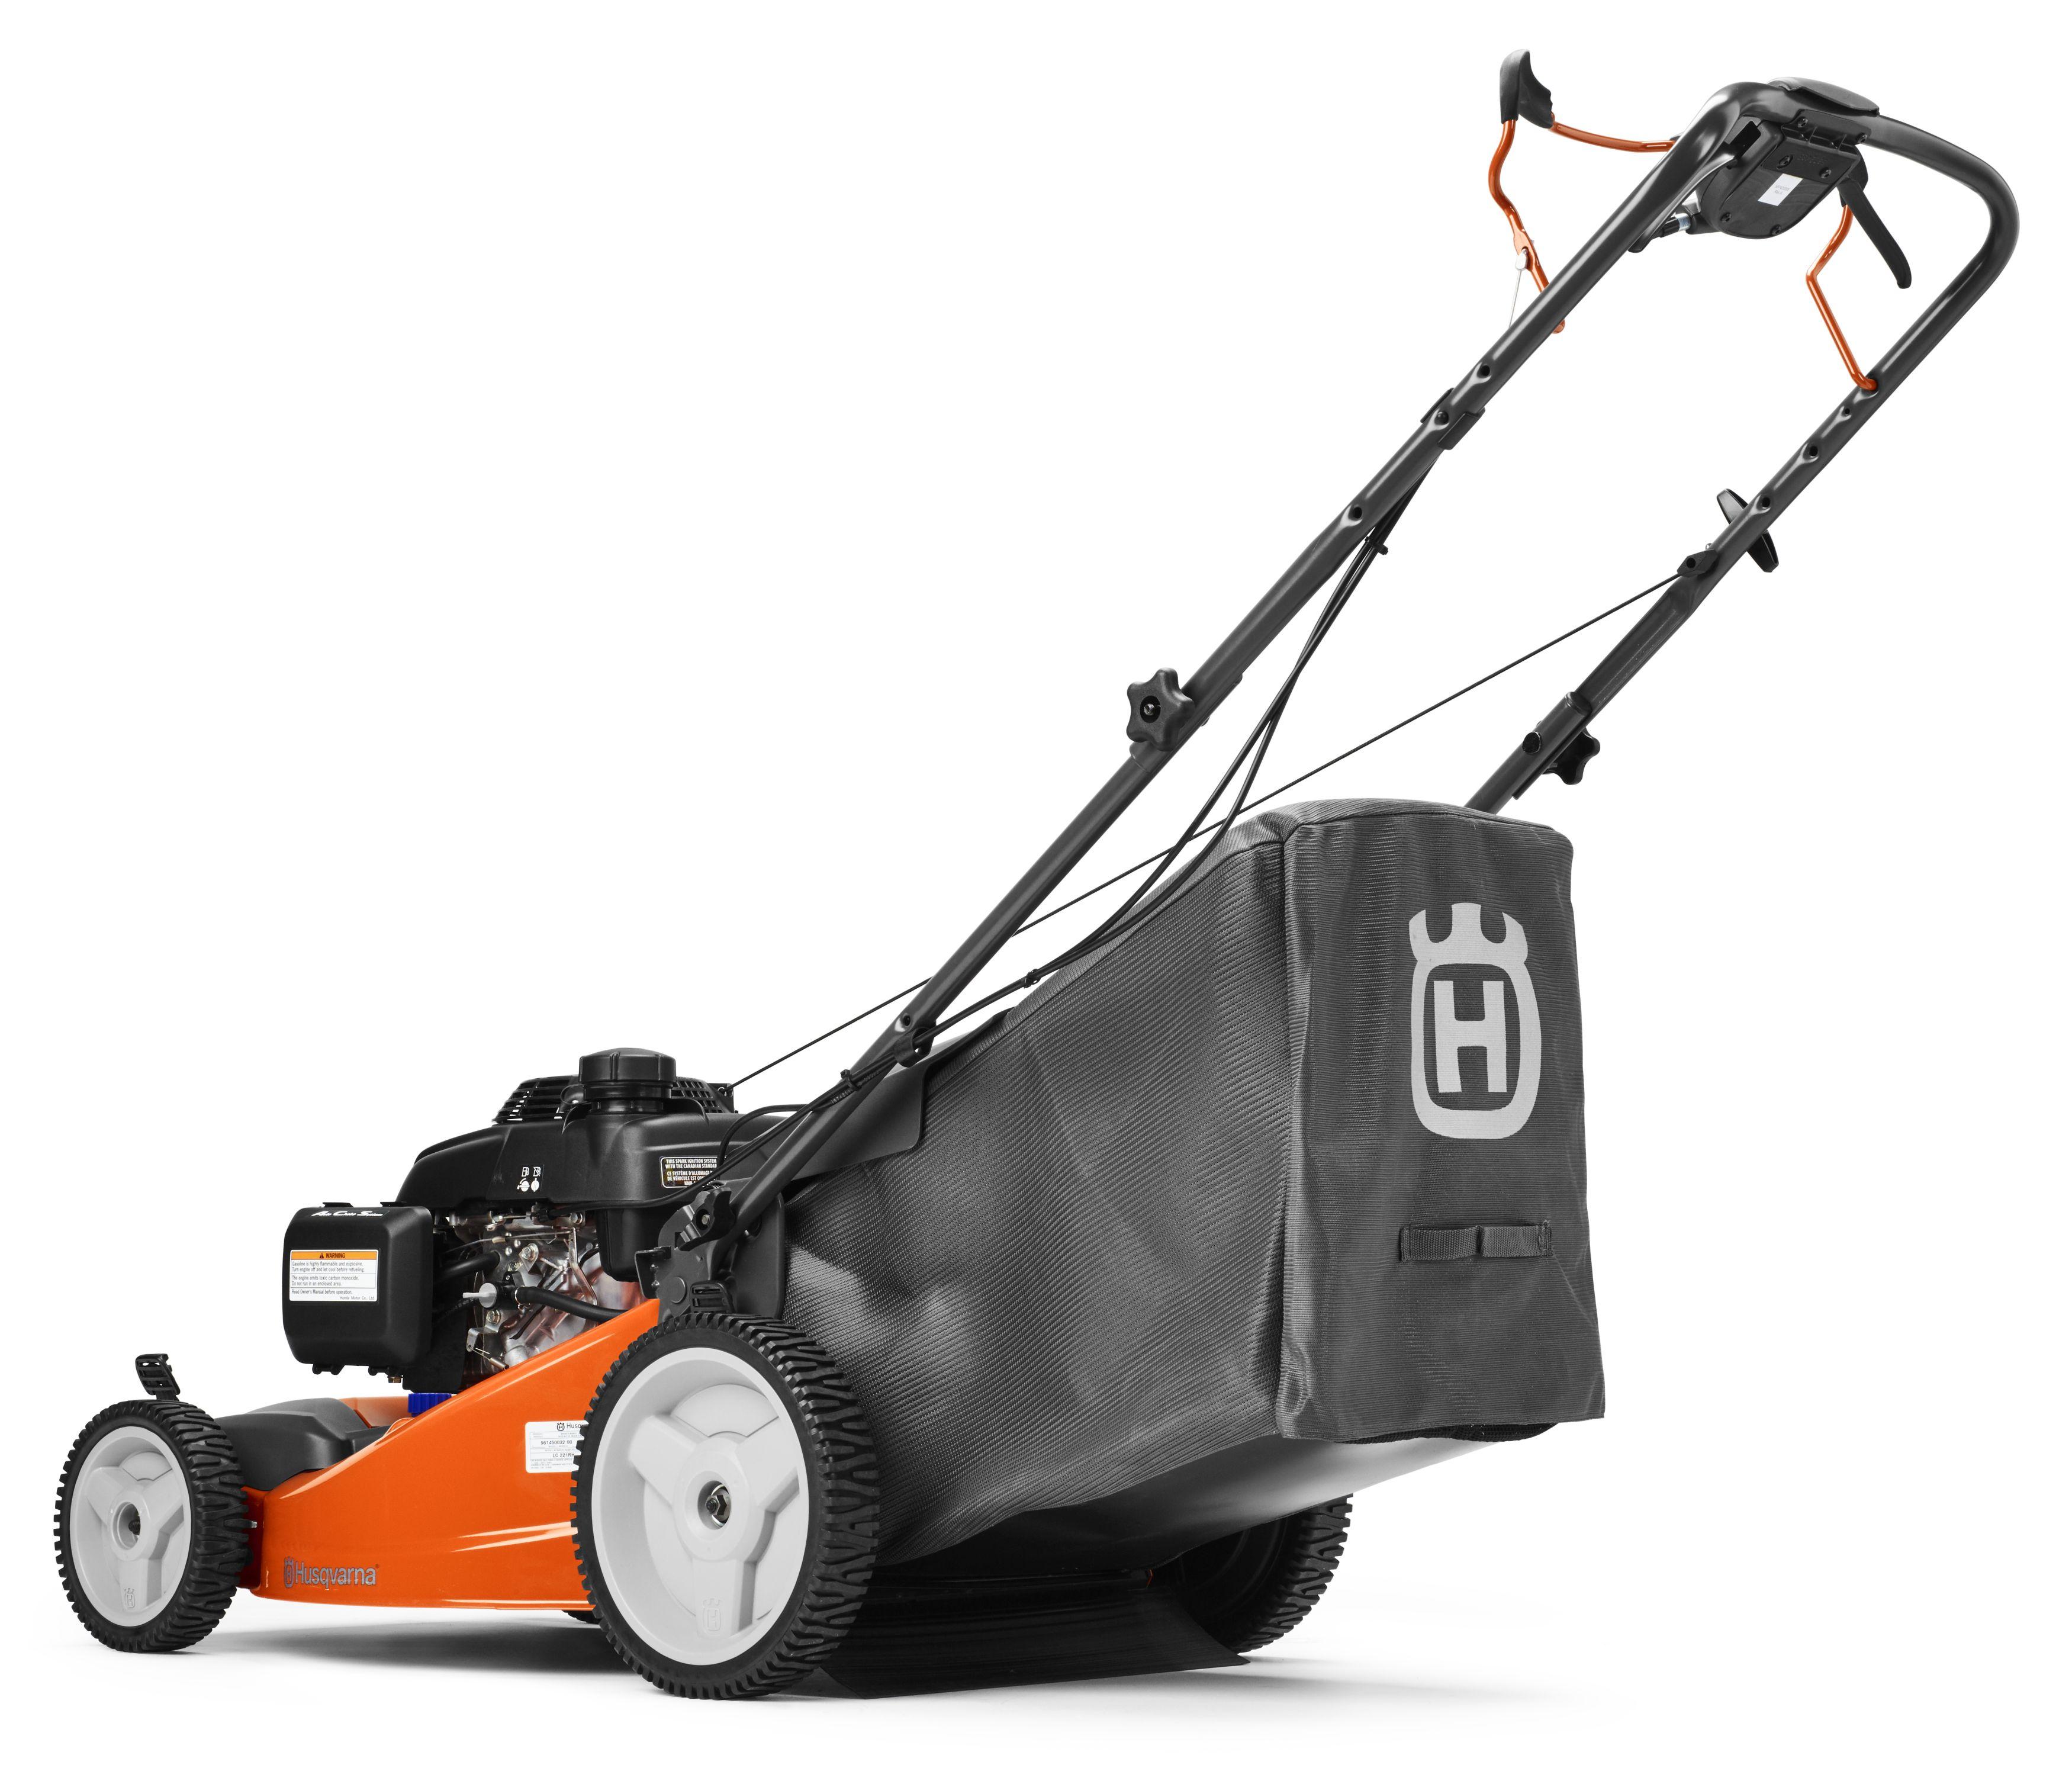 Lc 221rh Rear Wheel Drive Push Mower Husky Wiring Harness Kit